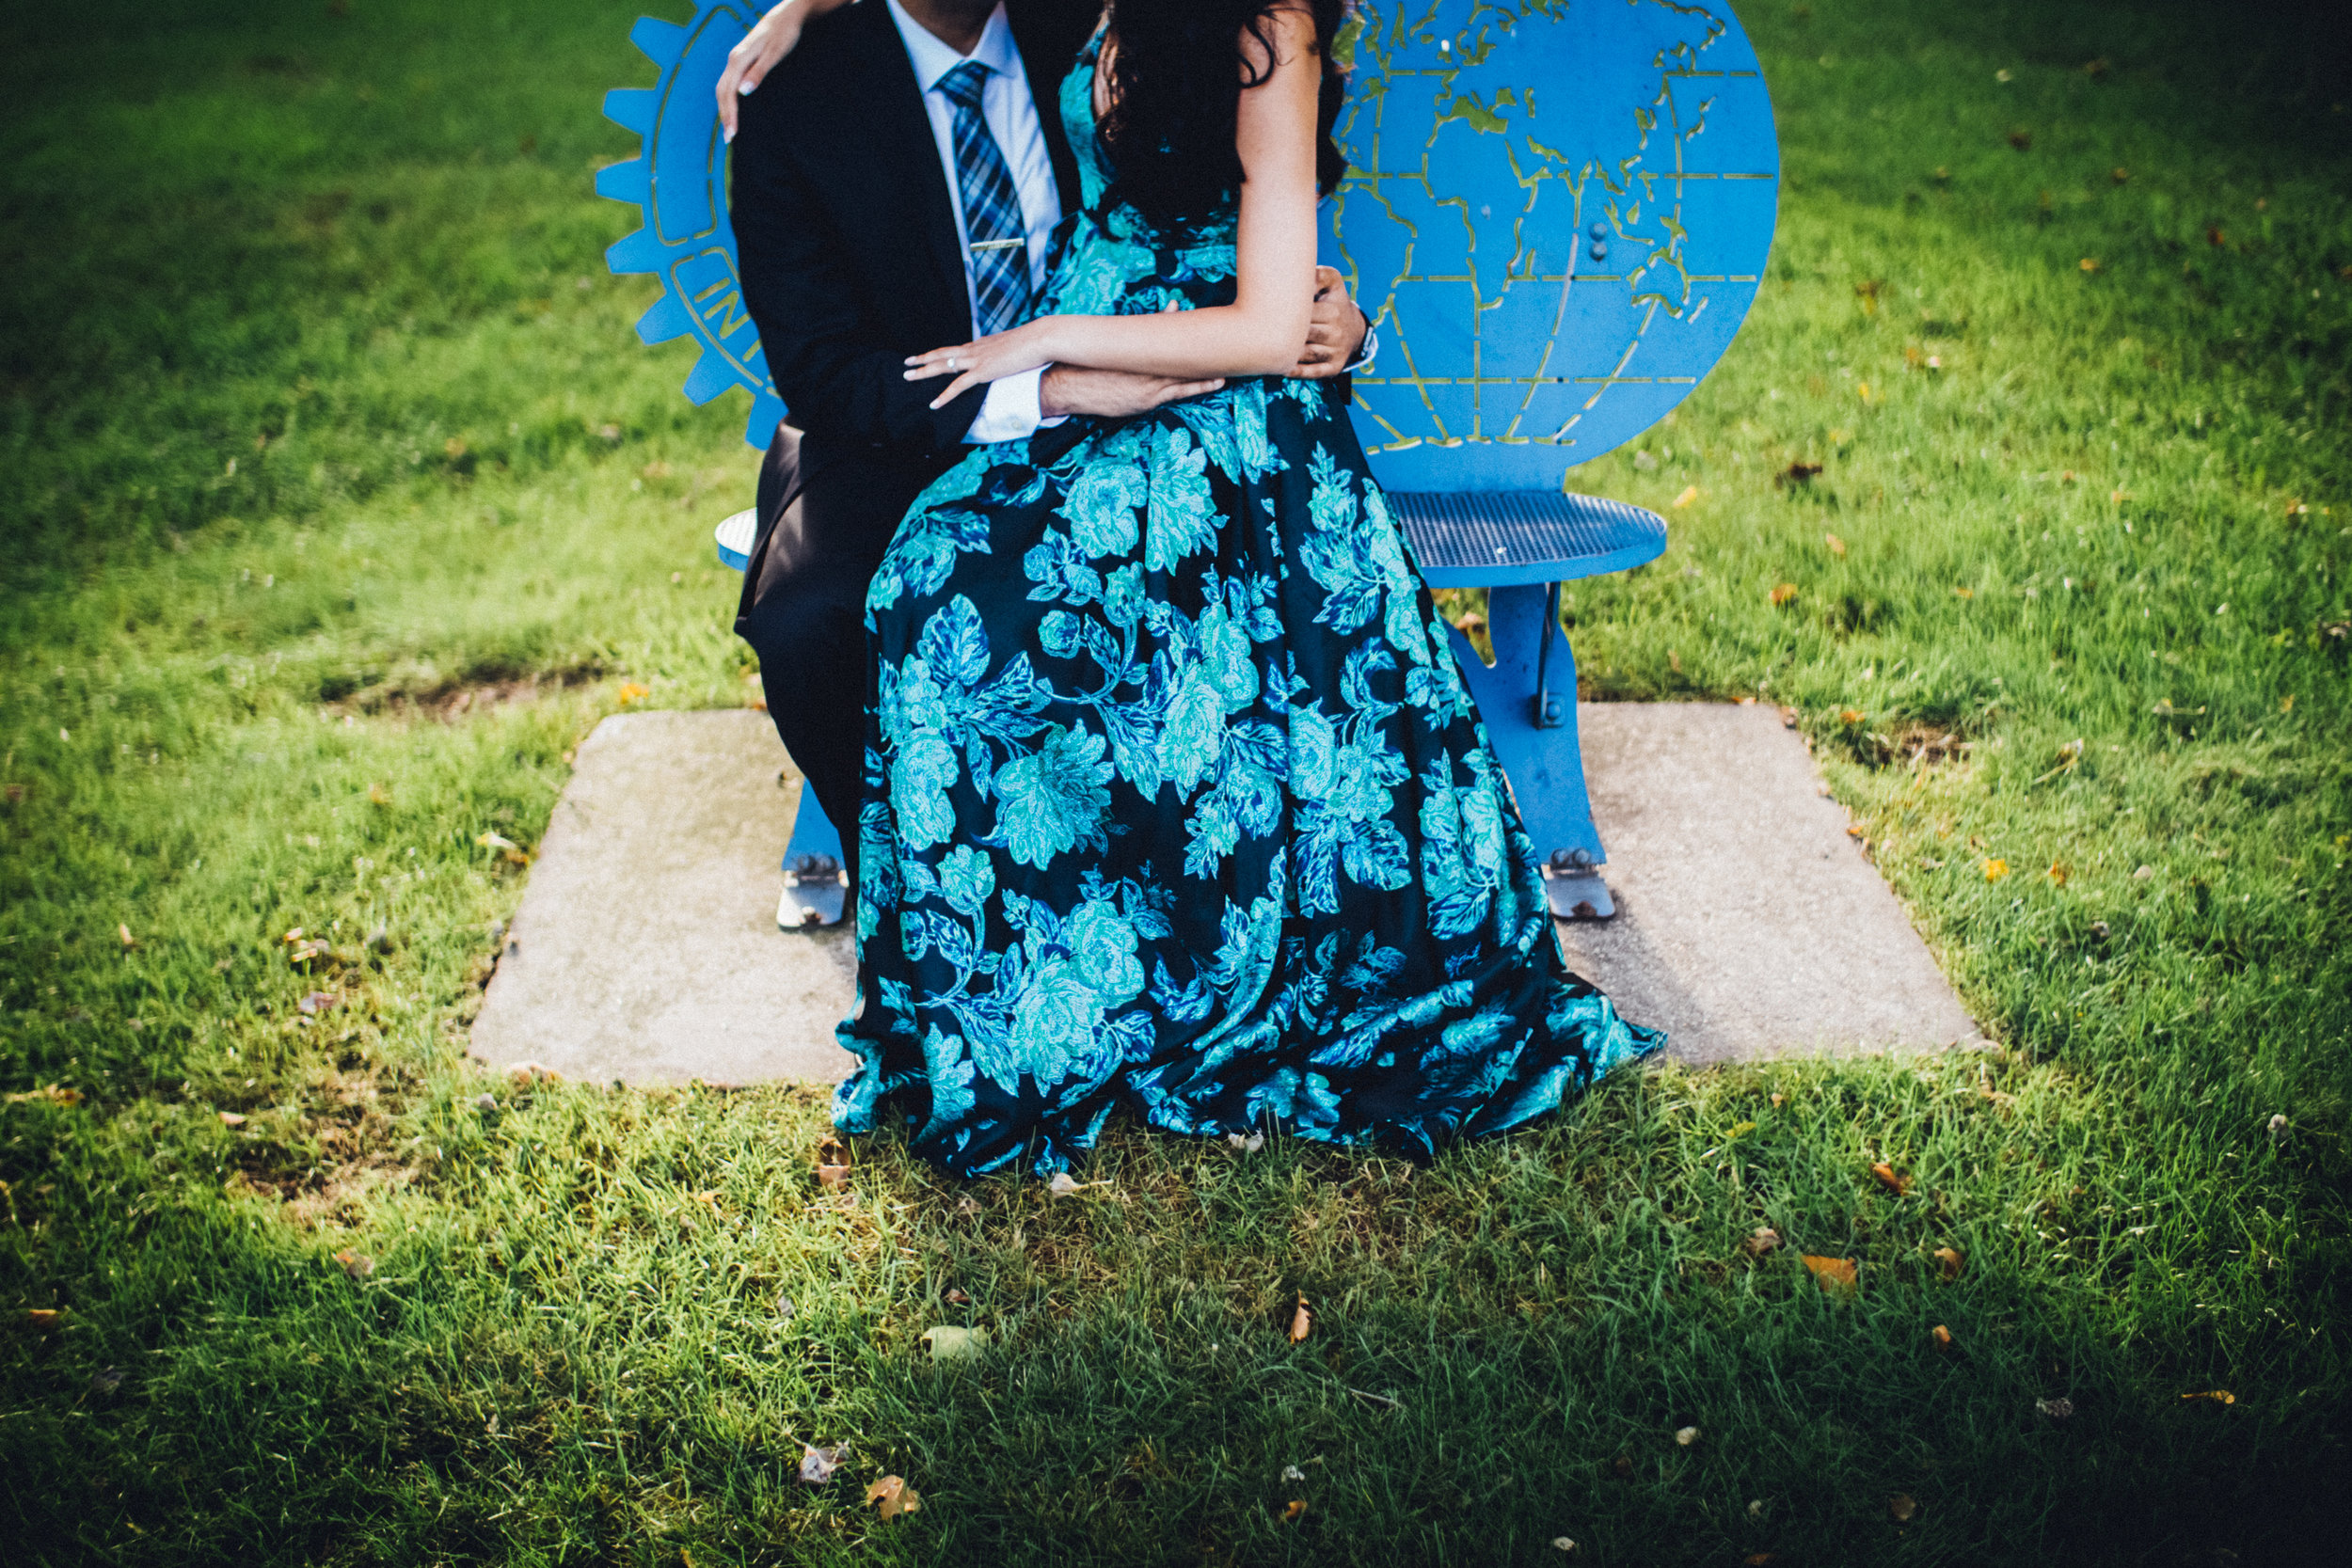 Shadow-Shine-Pictures-West-Michigan-Wedding-Photography-Photographers-Videographers-Videography-Cinematographers- Grand-Rapids-012